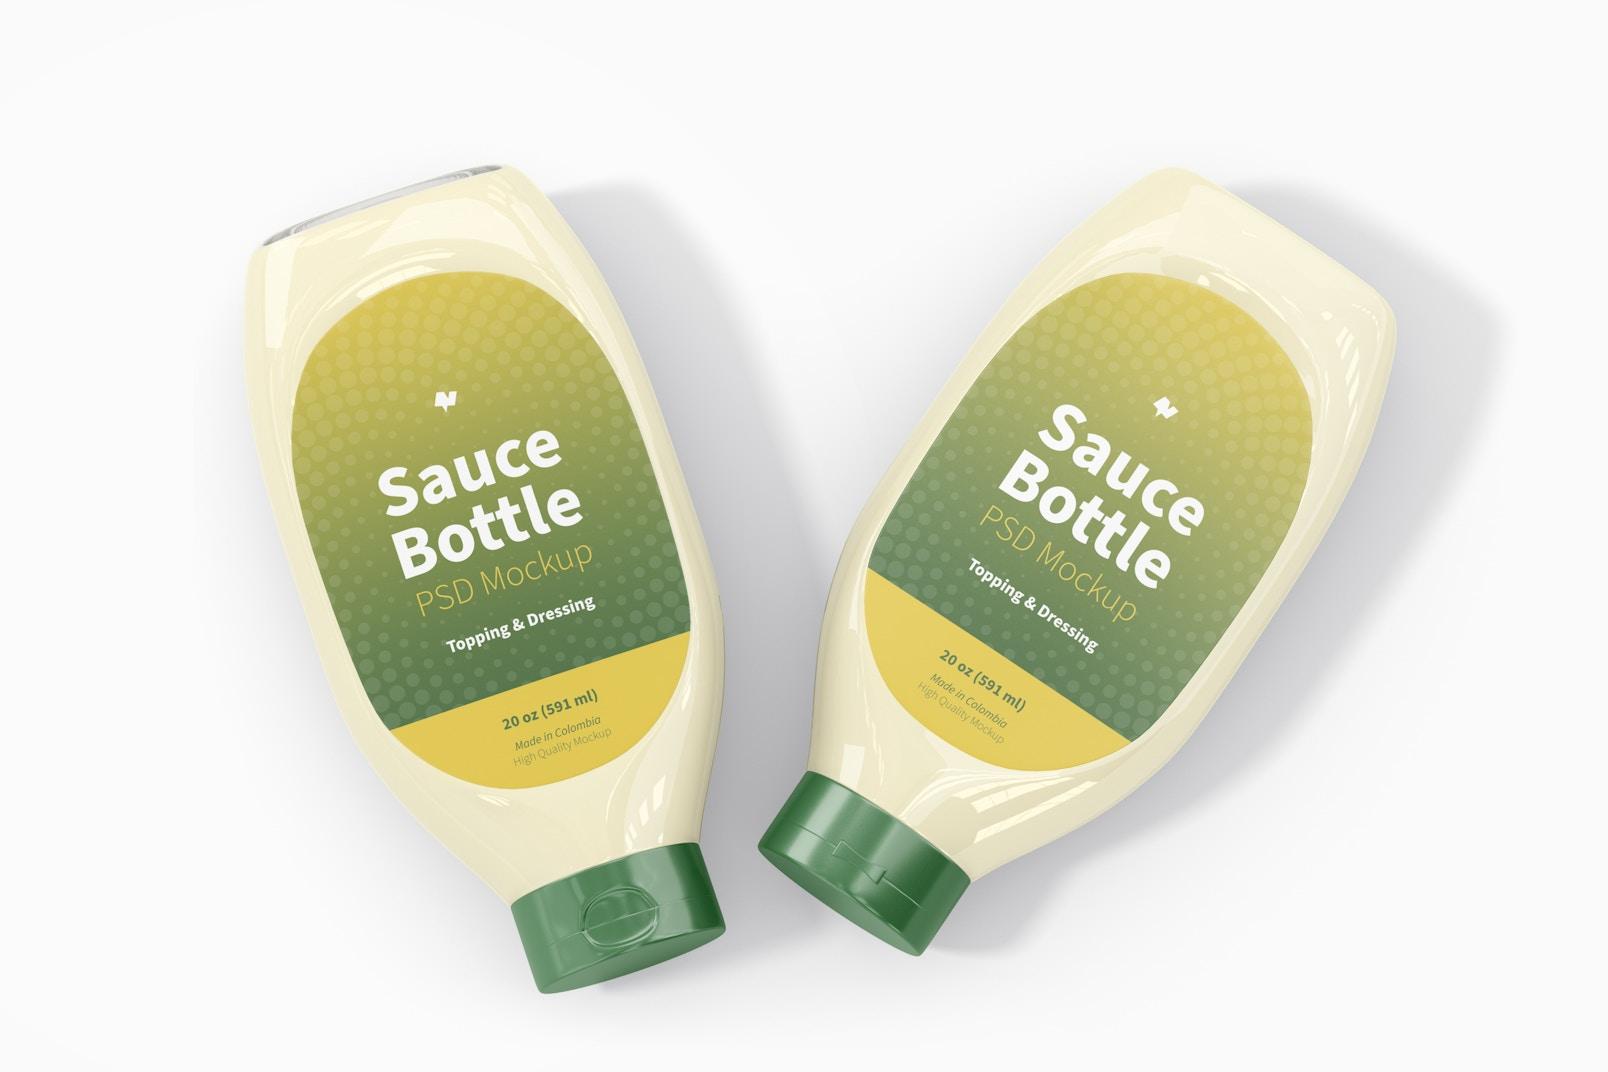 20 oz Sauce Bottle Mockup, Top View